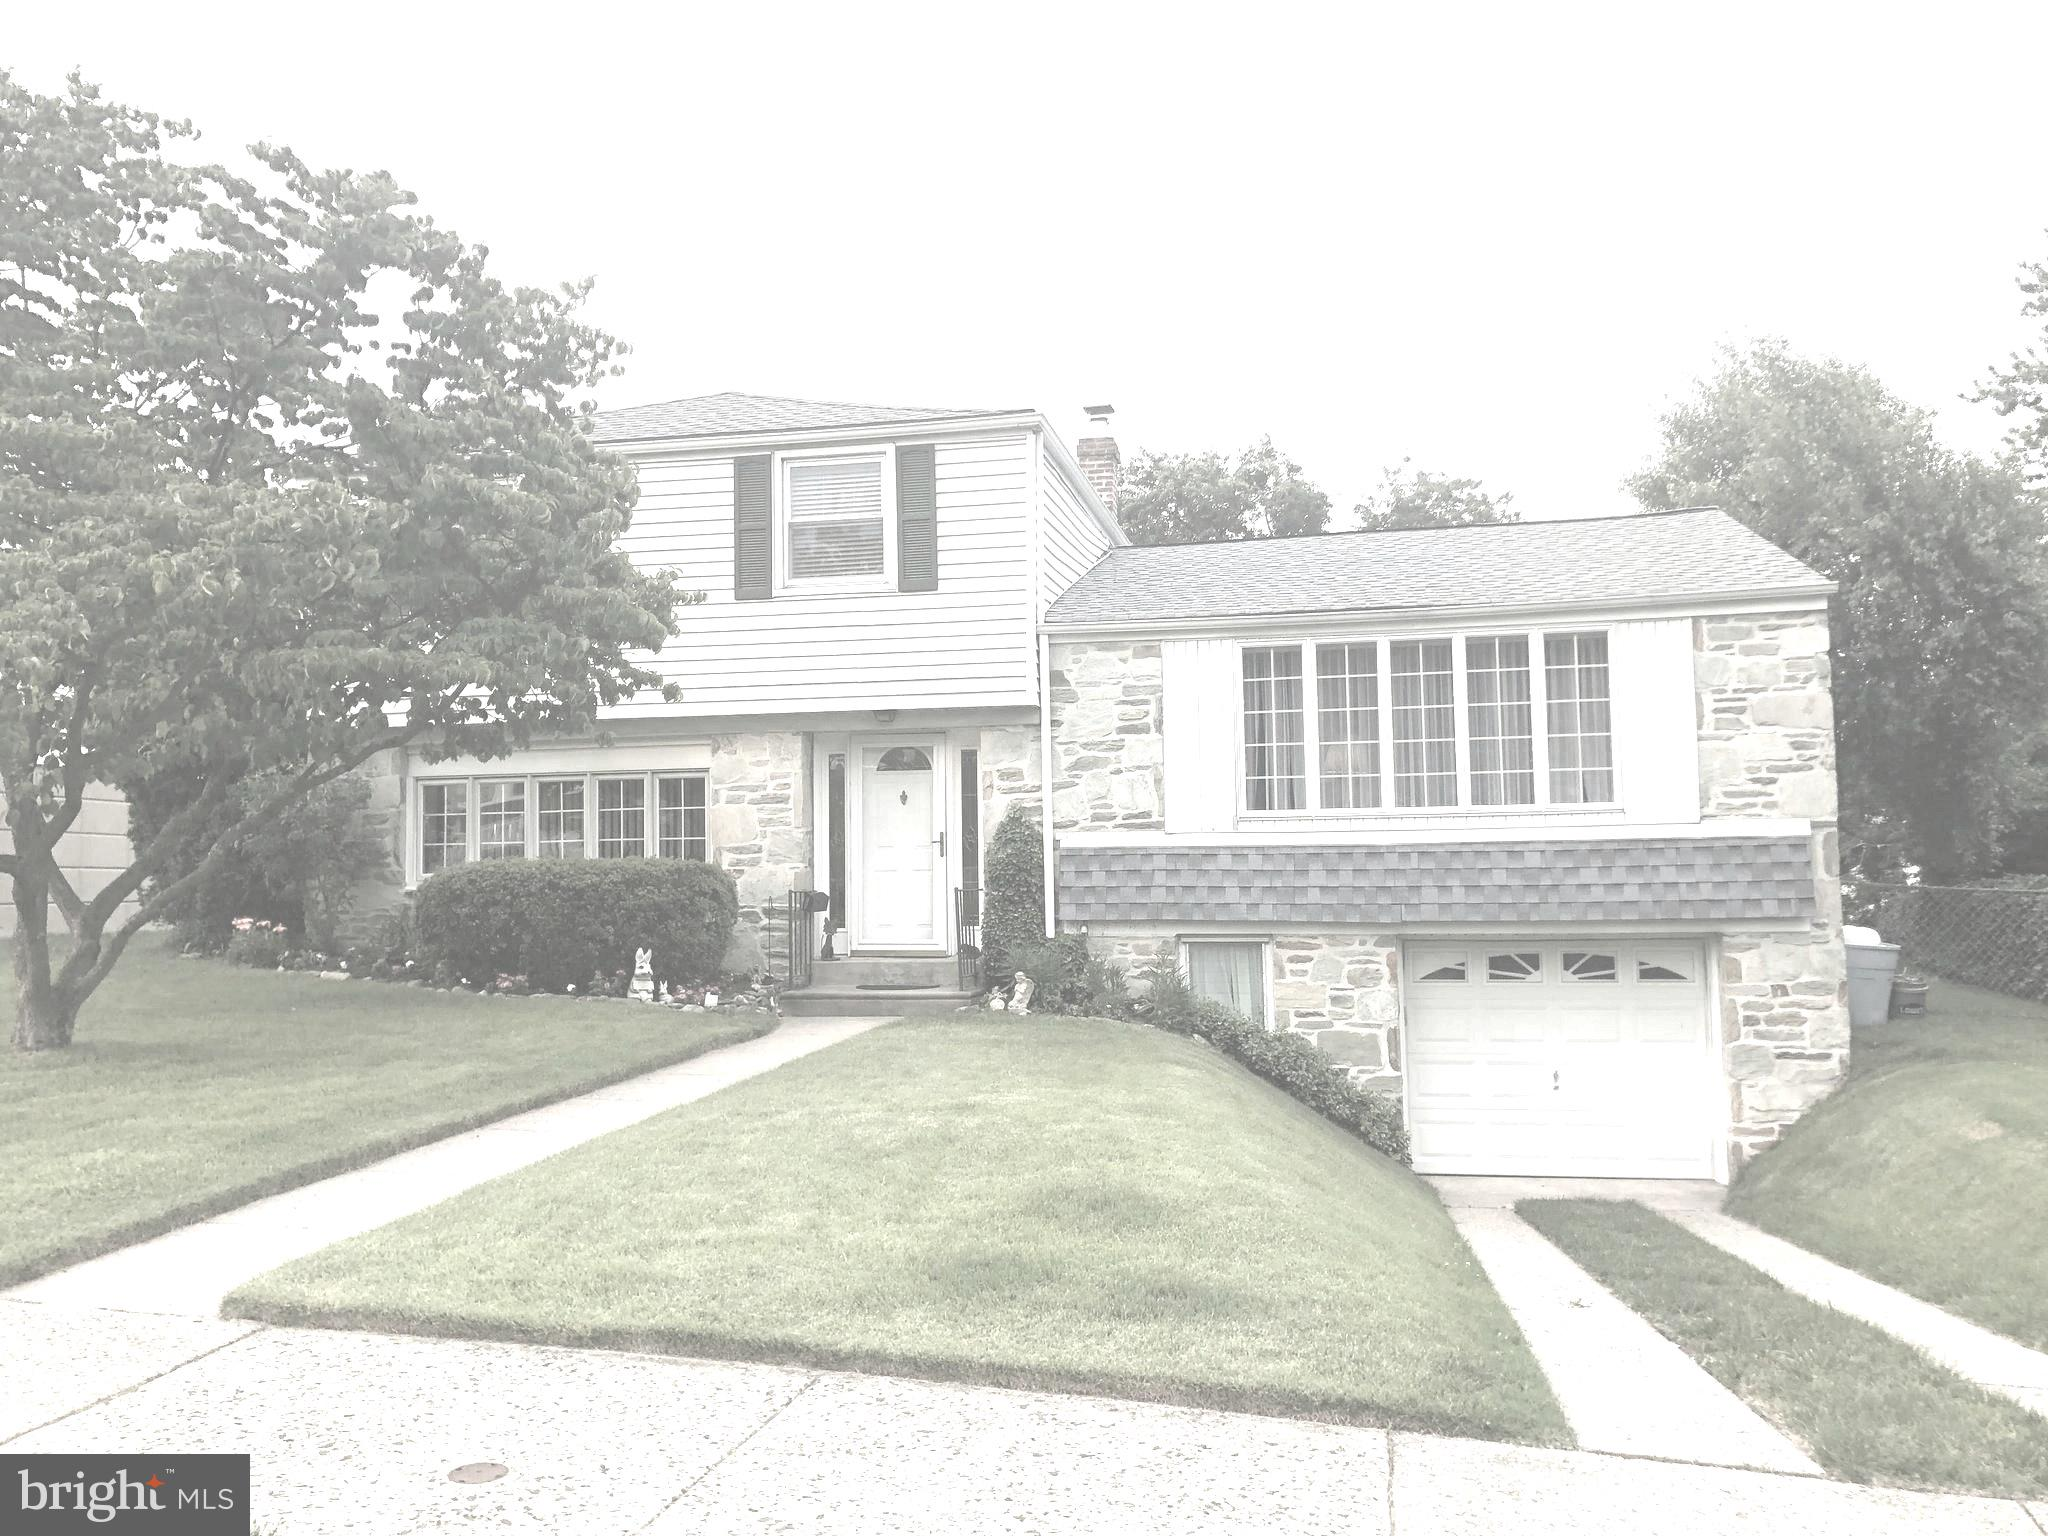 805 SELMA STREET, PHILADELPHIA, PA 19116